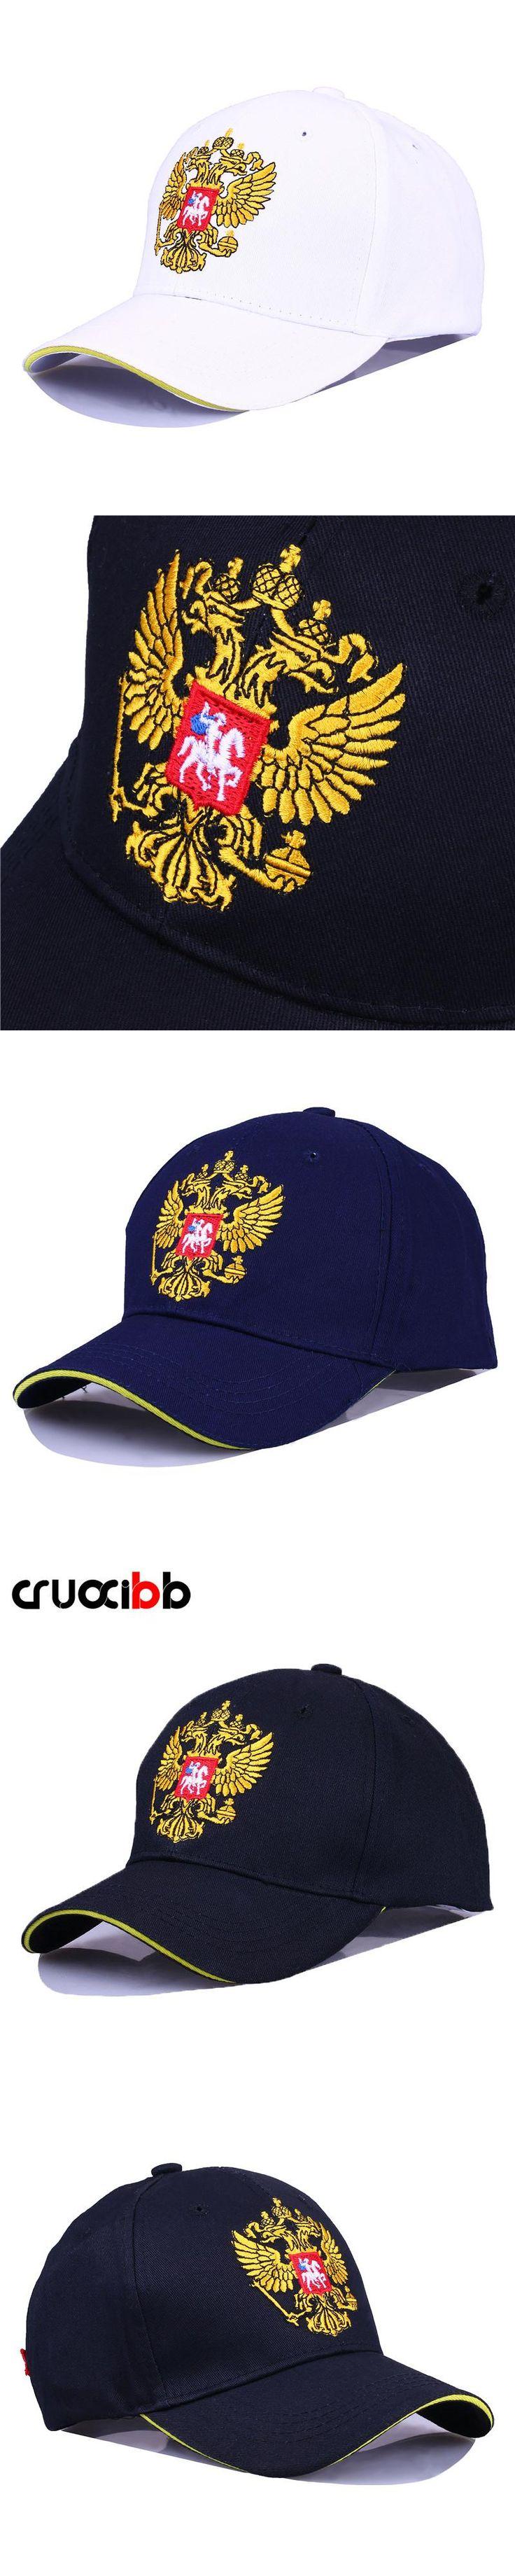 CRUOXIBB Brand Baseball Caps Russian Emblem Embroidery Snapback  Sports Hats Bone Men Women Patriot Caps Fashion Outdoor Hat